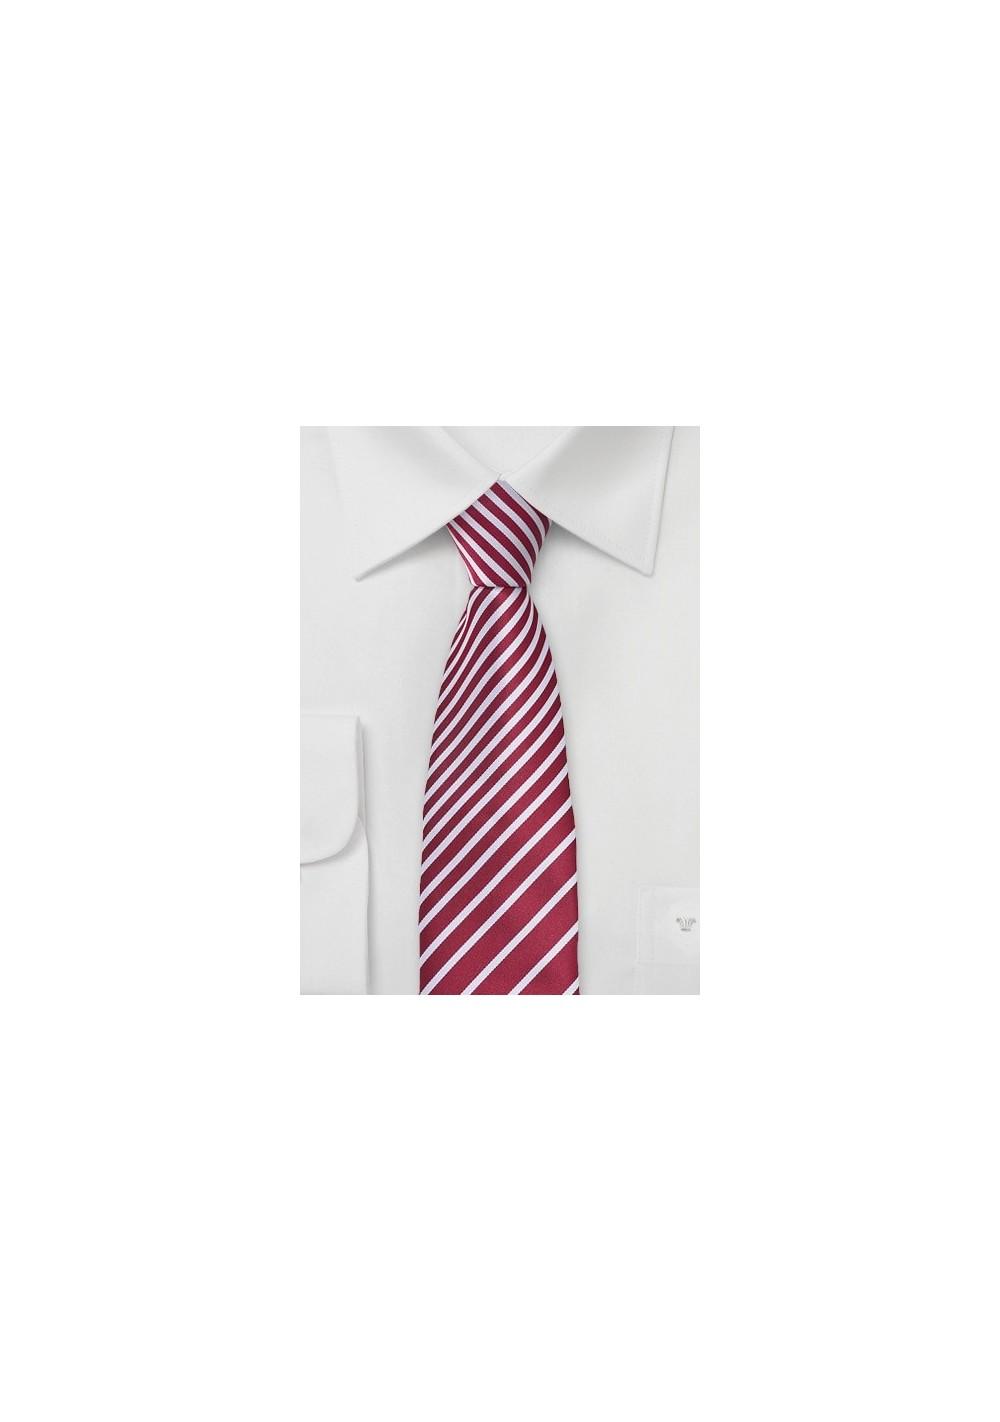 Modern Striped Tie in Rosewood